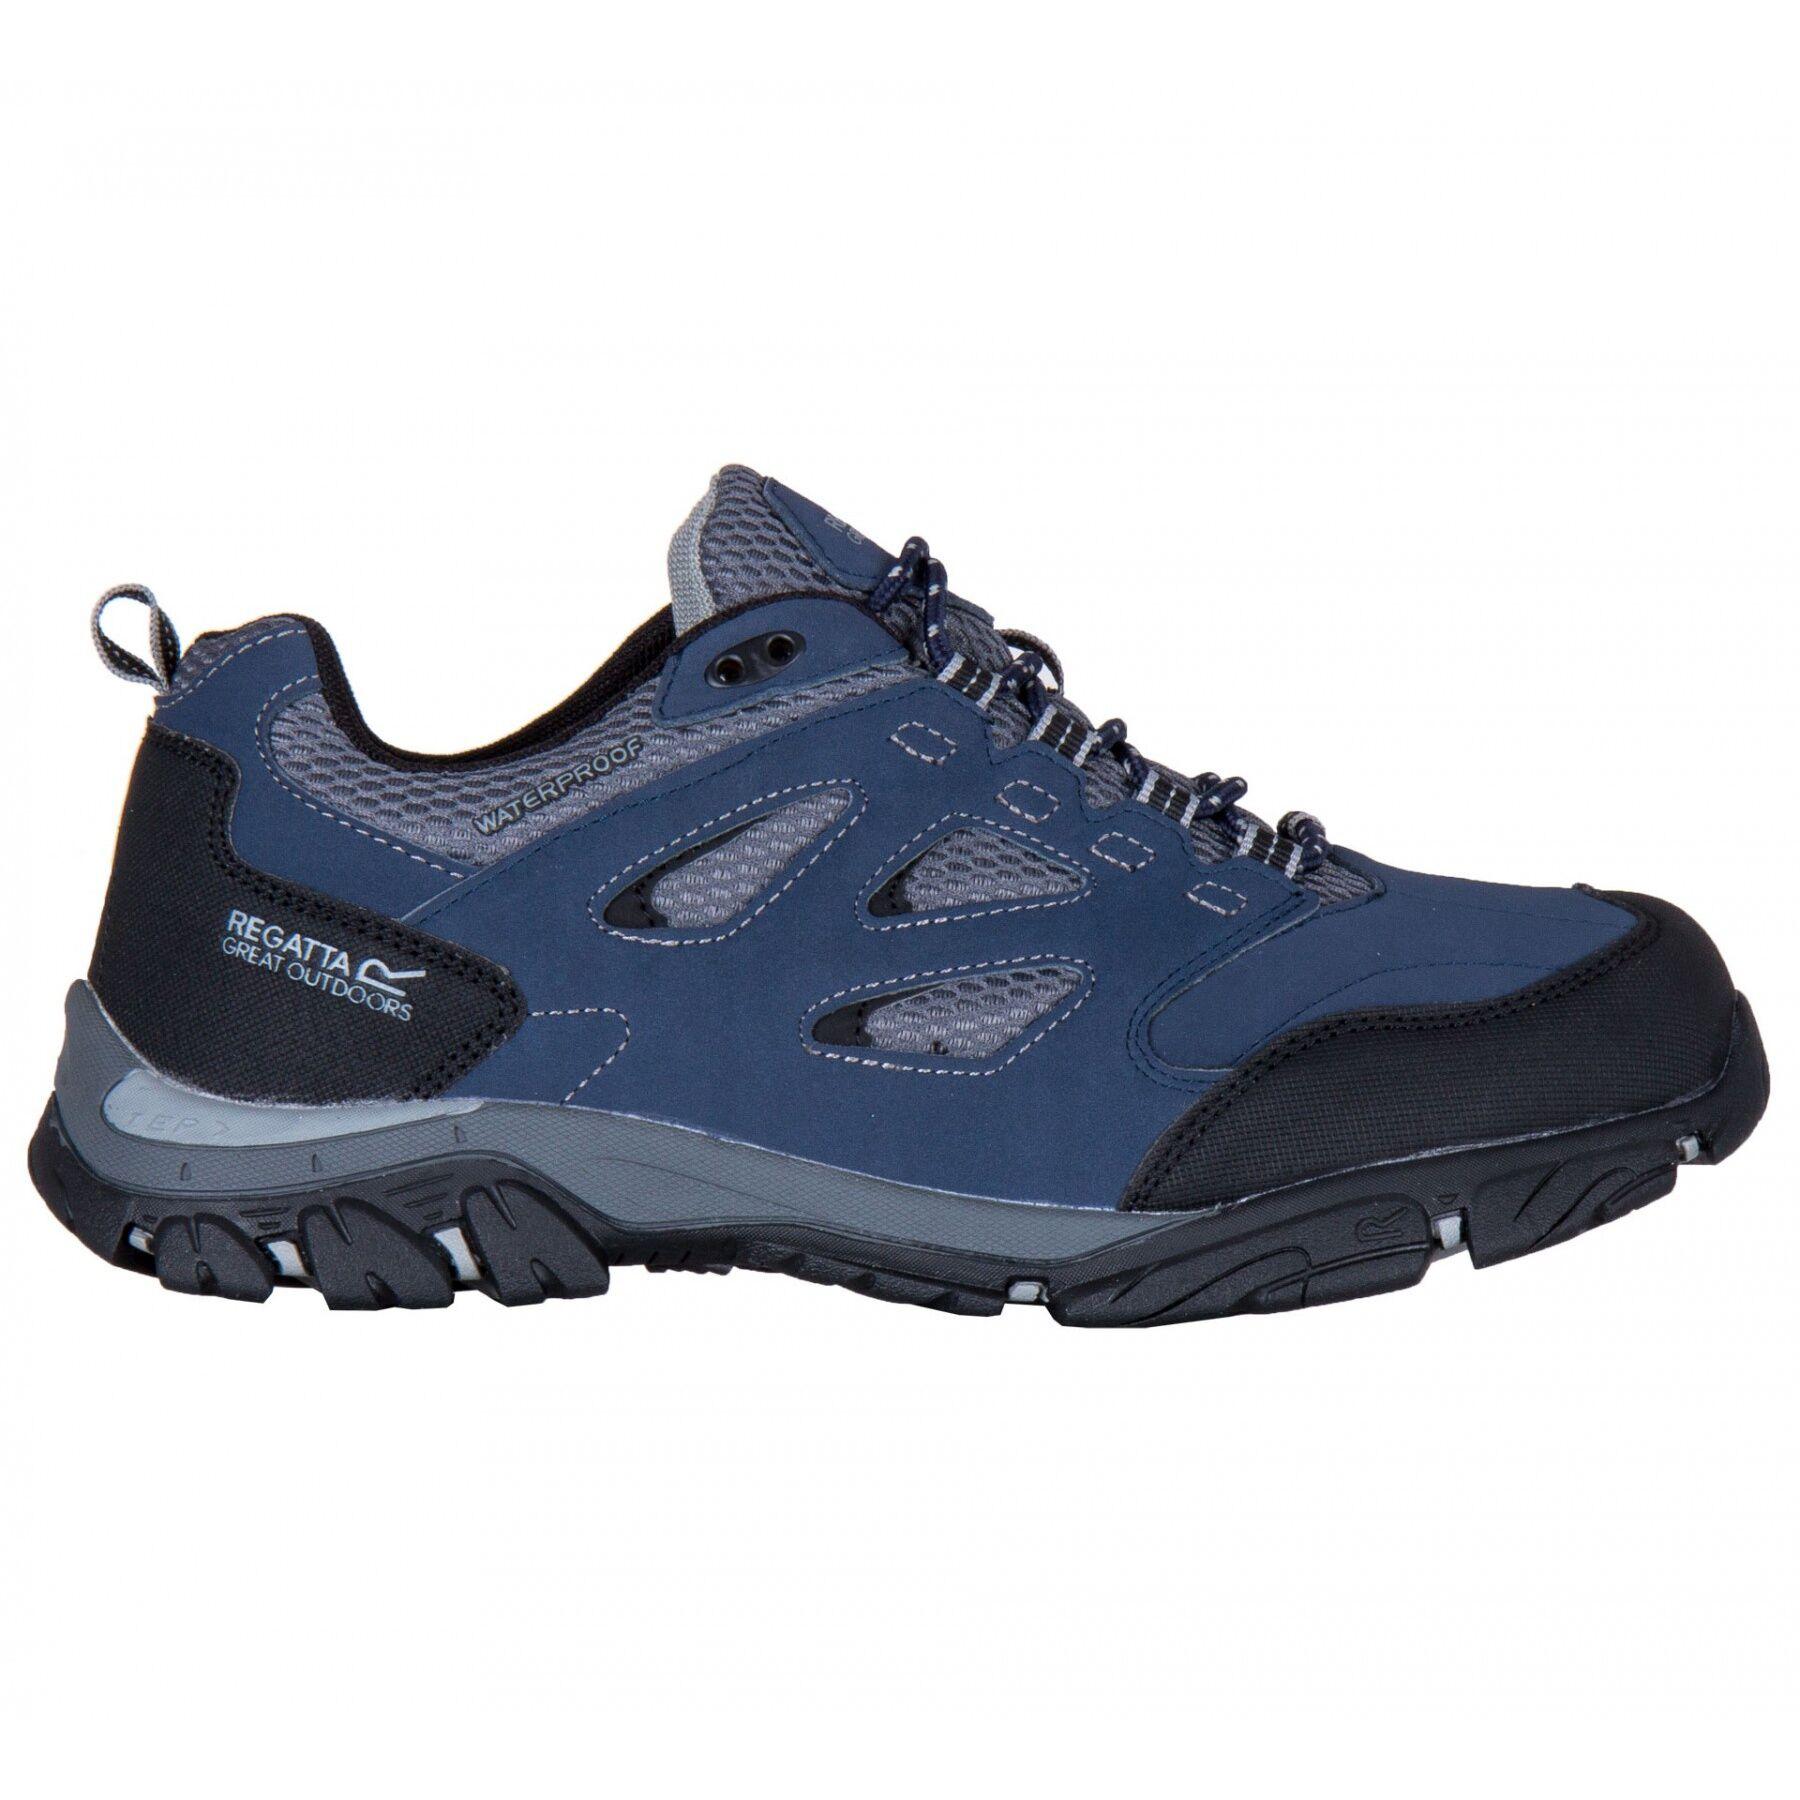 Regatta - Chaussures De Randonnée Holcombe Iep - Homme (Khaki/D'oree) - UTRG3659